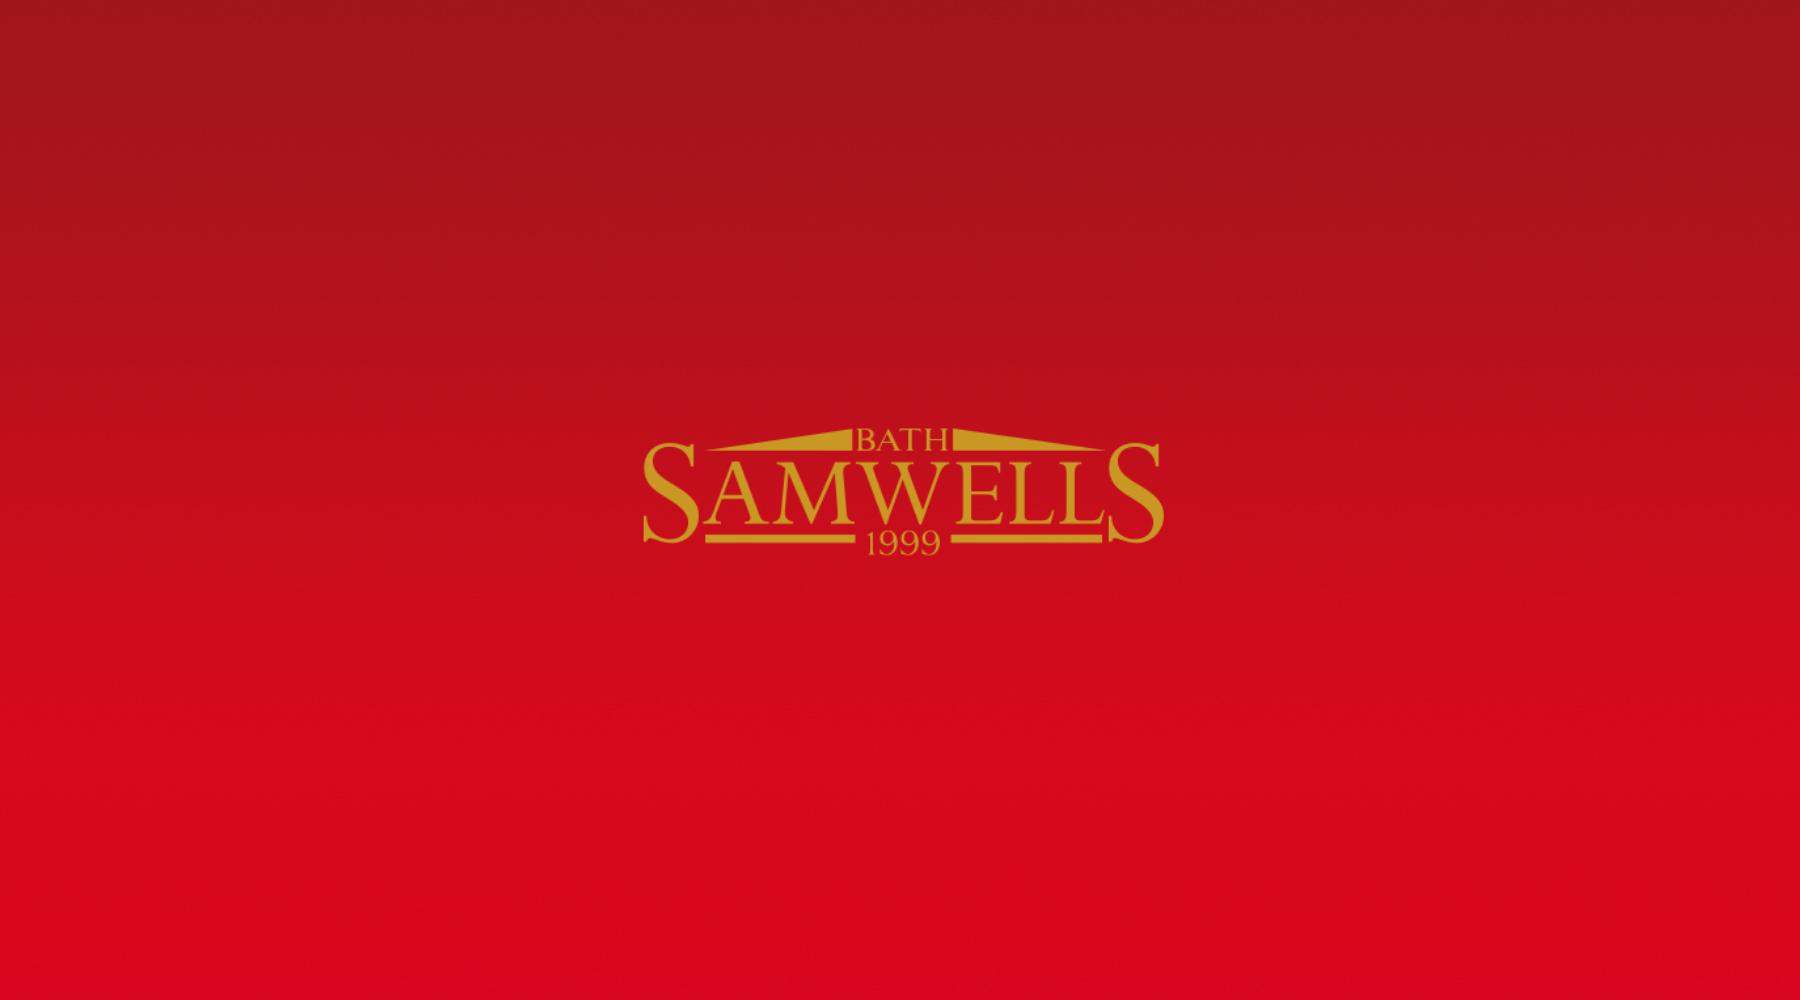 Samwells website design